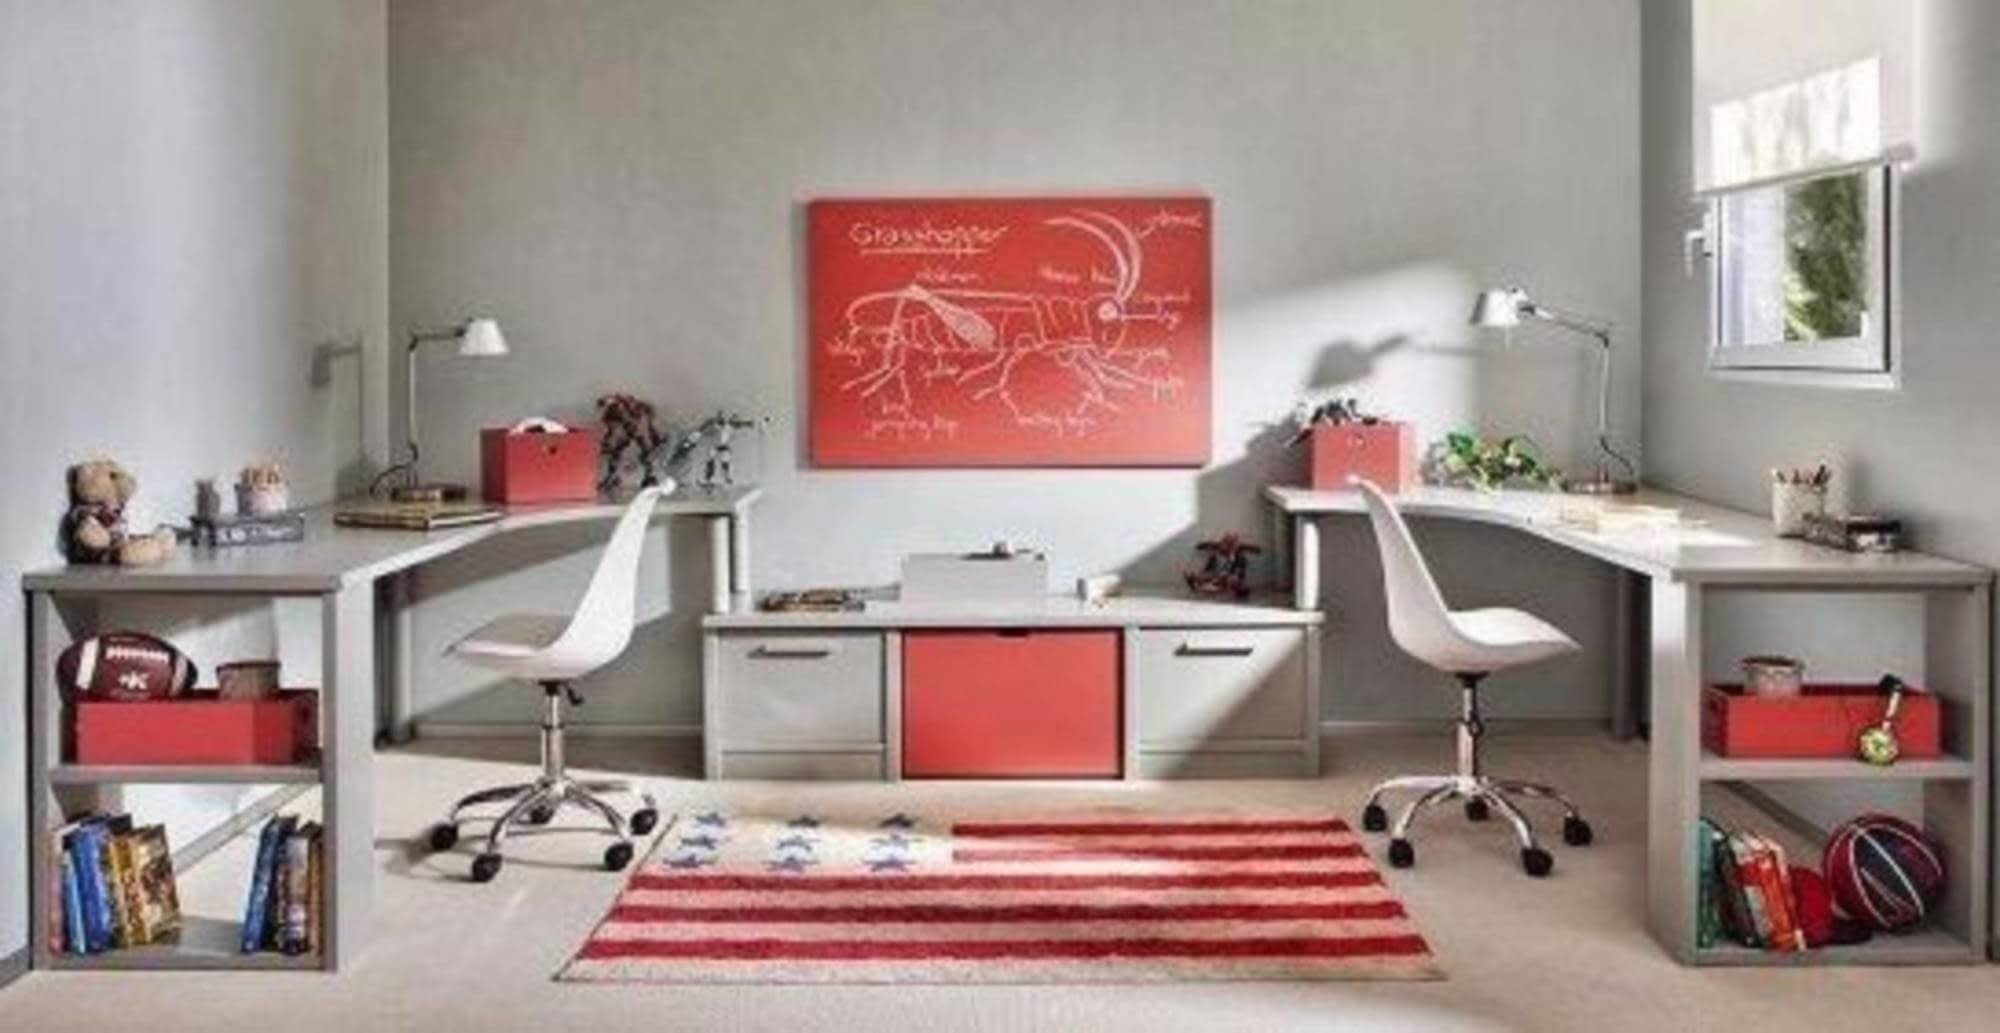 Muebles En Rivas Awesome Catalogo De Muebles Muoz With Muebles En  # Muebles Remar Alcala De Henares